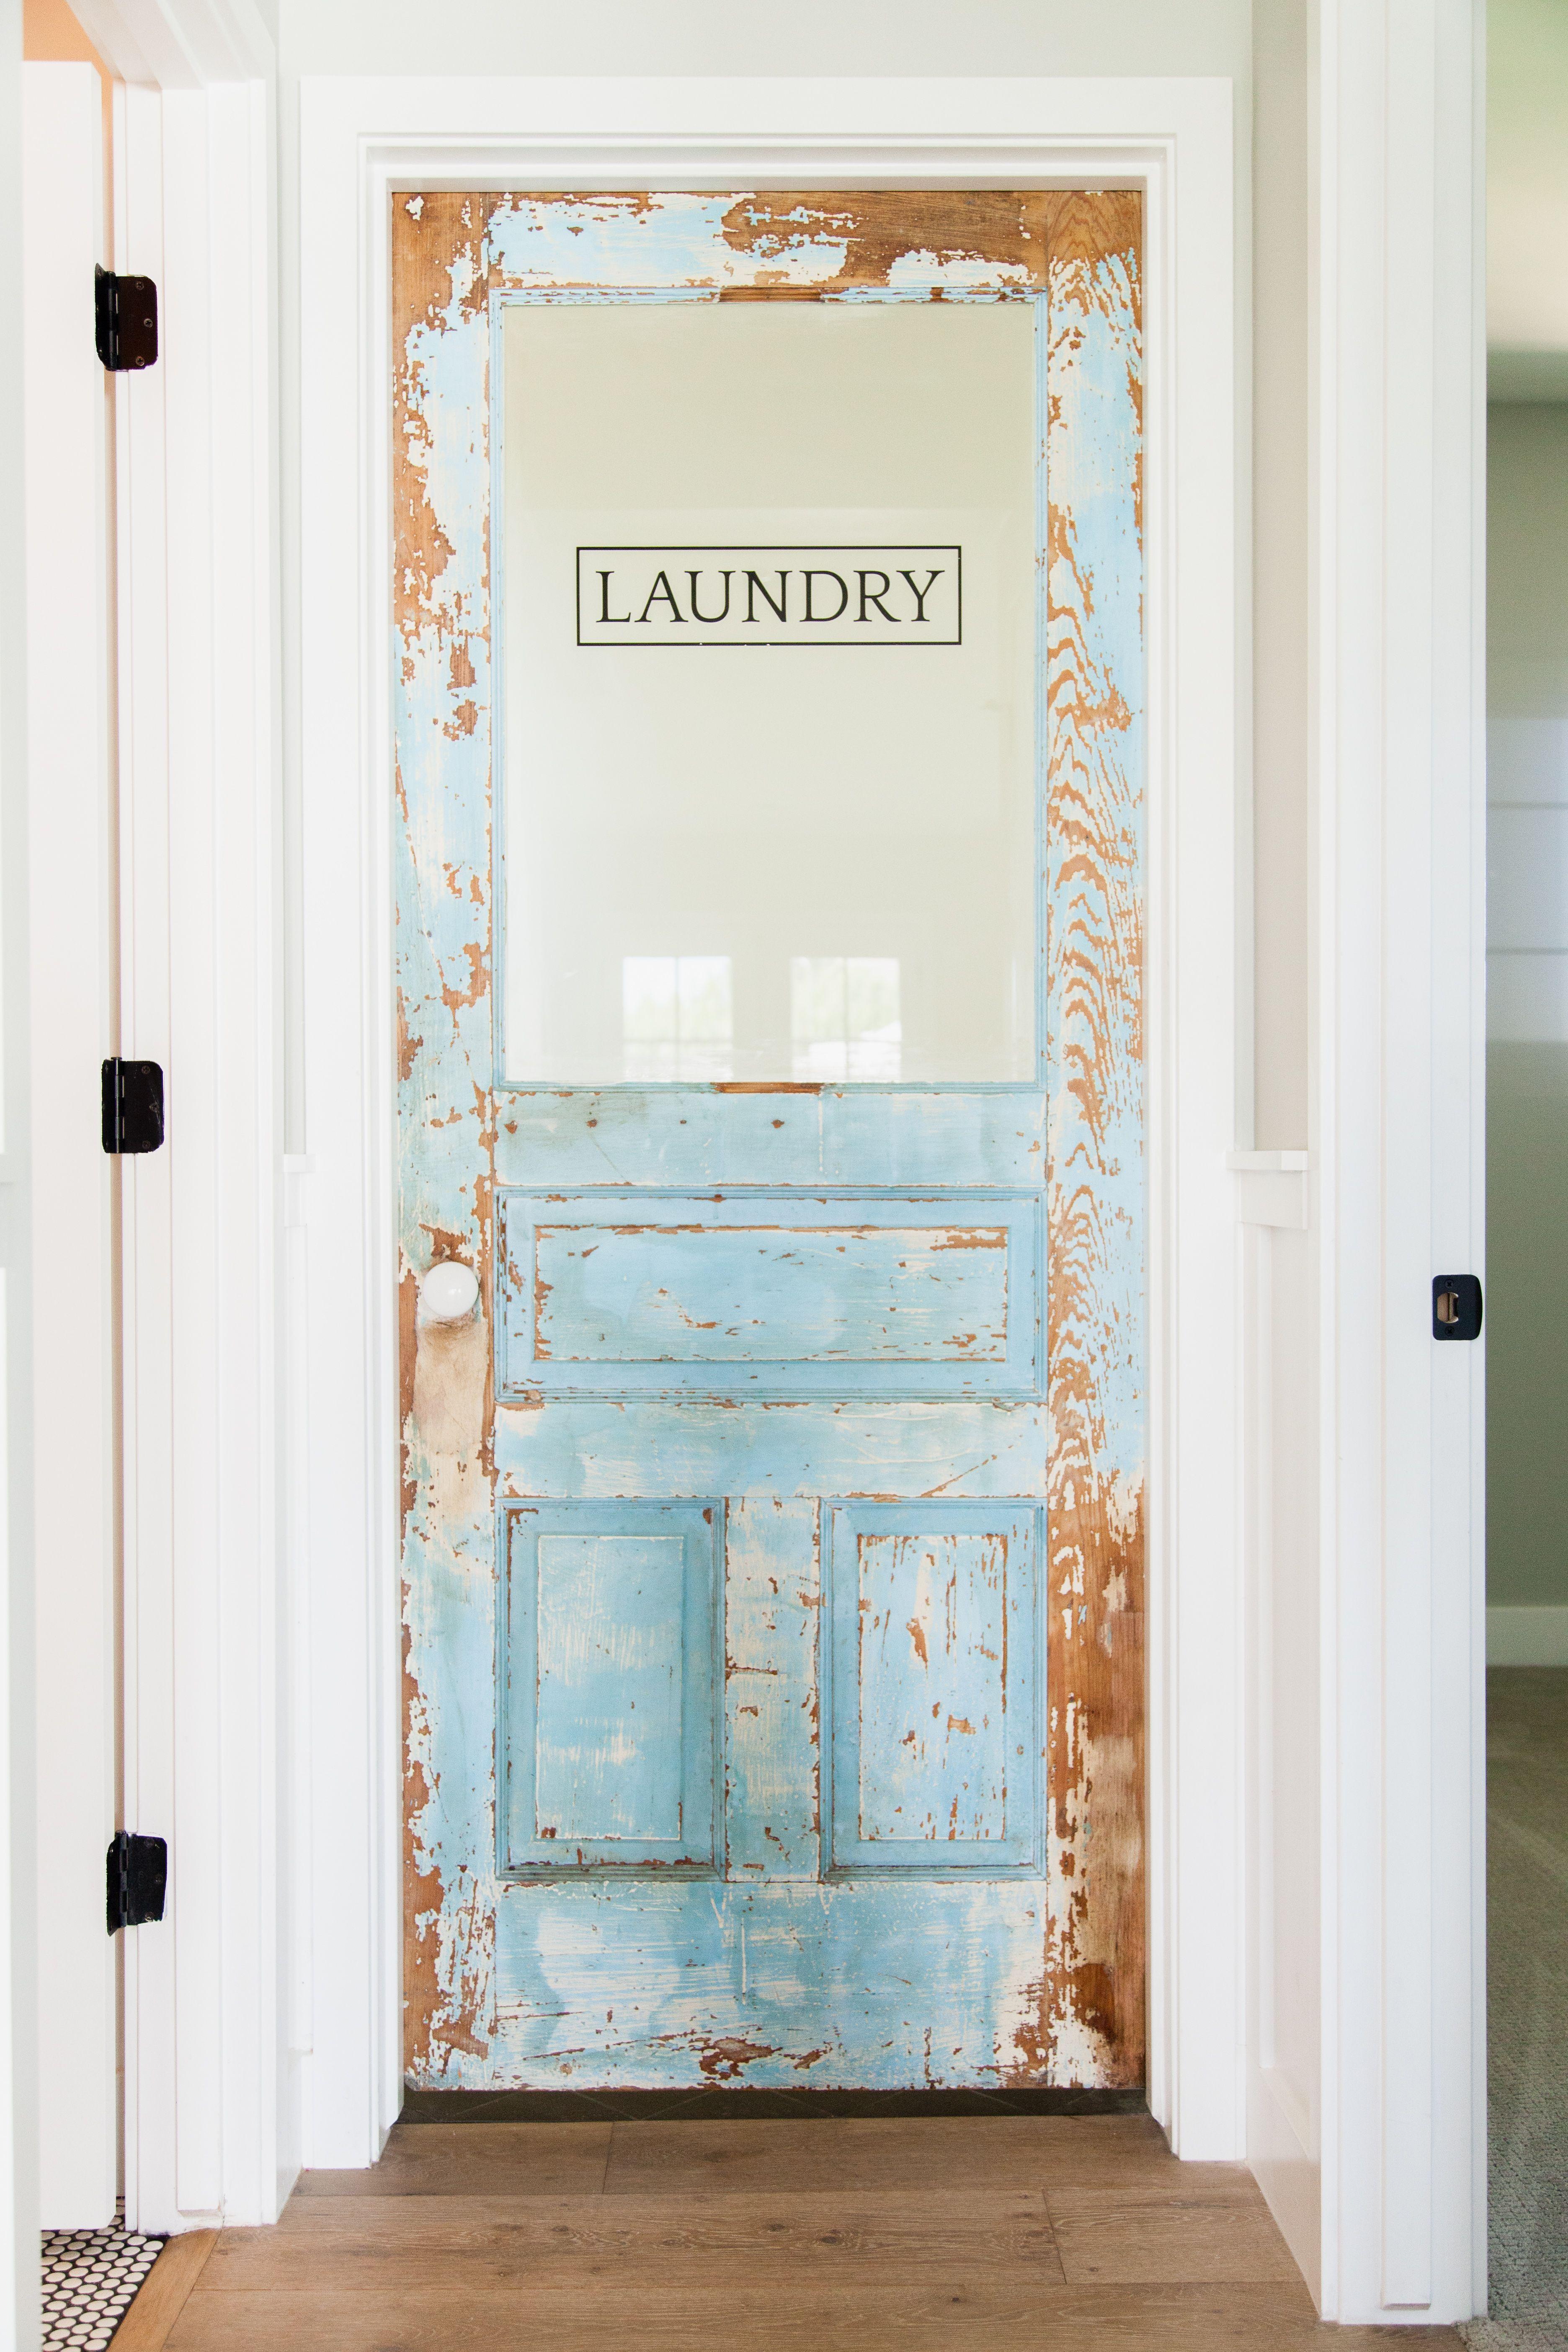 Ordinaire Custom Laundry Door With Original Vintage Paint   By Rafterhouse.